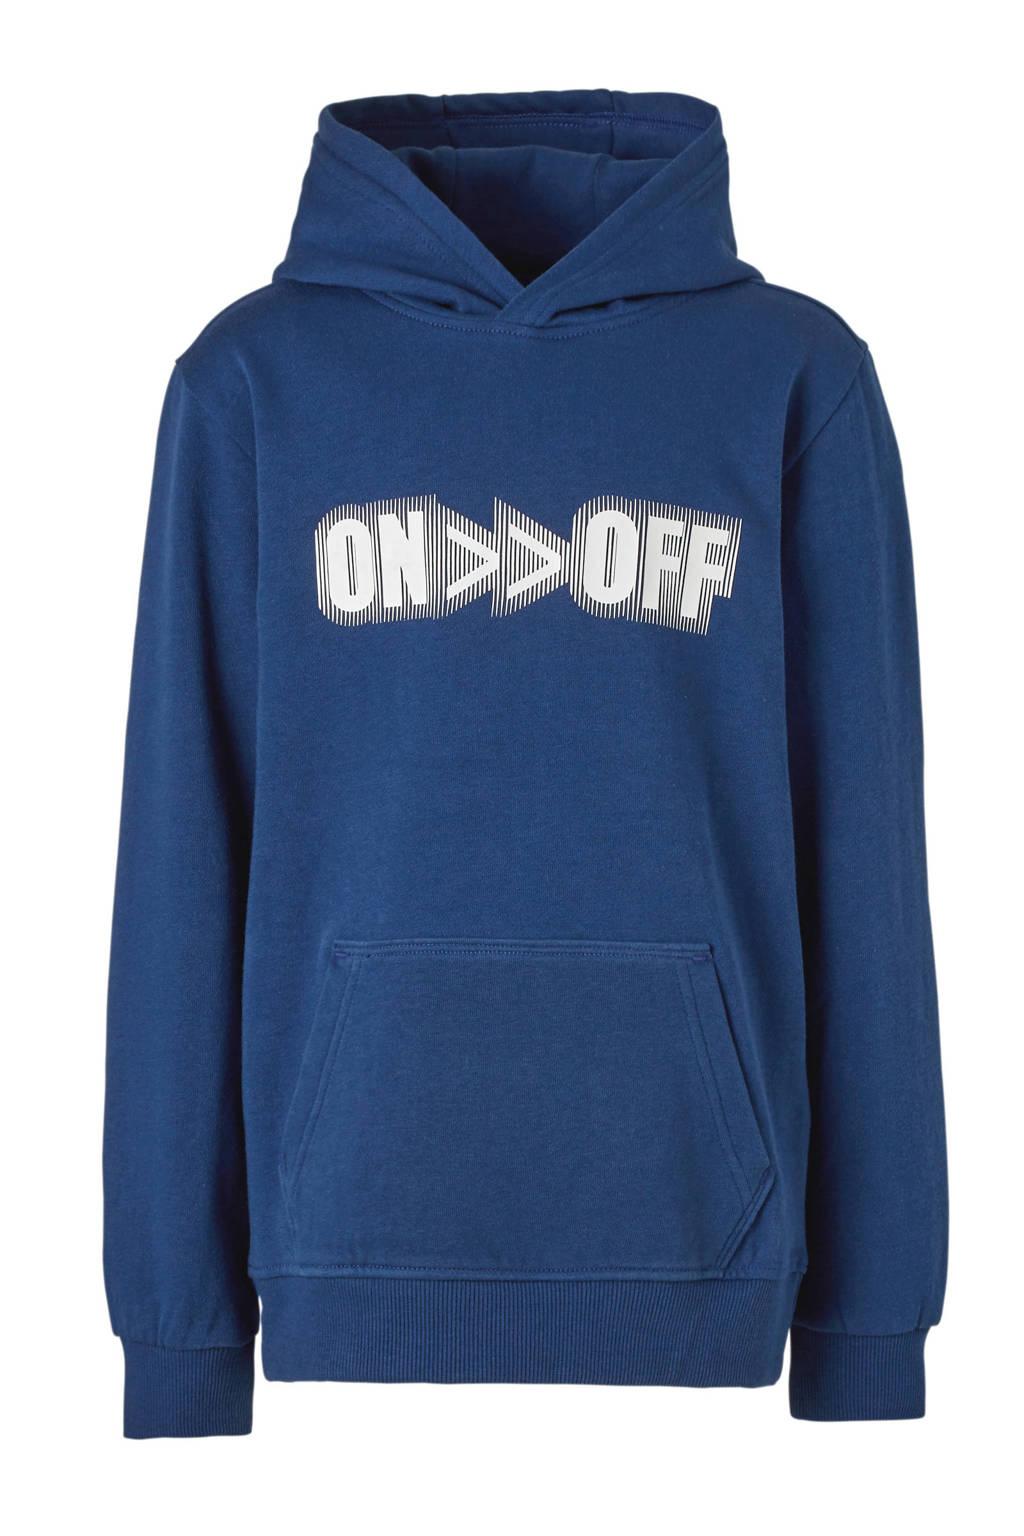 Mitch hoodie Mex donkerblauw, Donkerblauw/wit